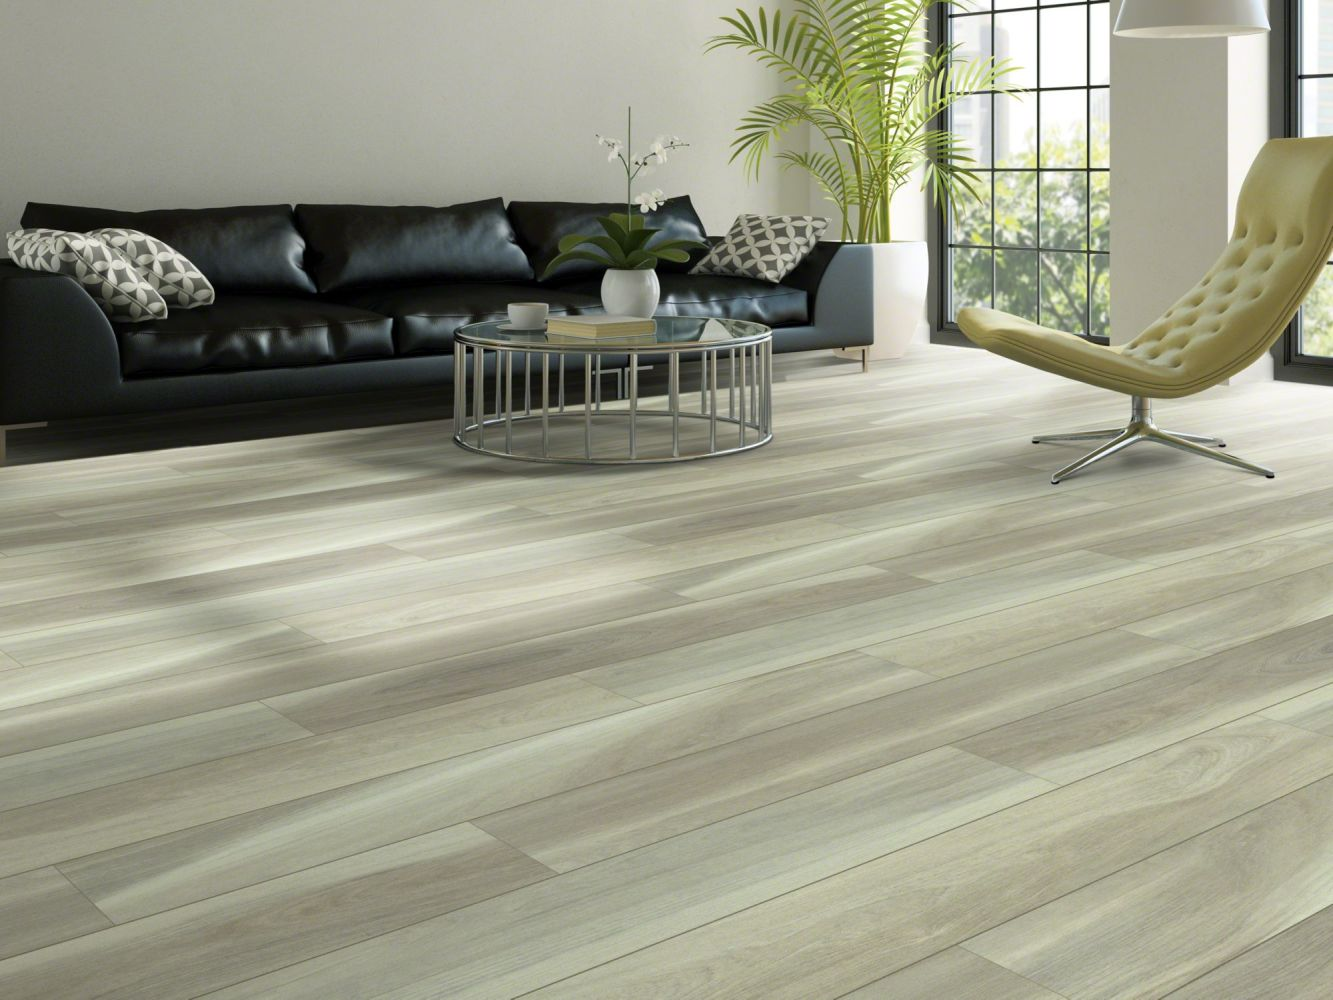 Shaw Floors Vinyl Residential Intrepid HD Plus Appalachian Oak 00169_2024V